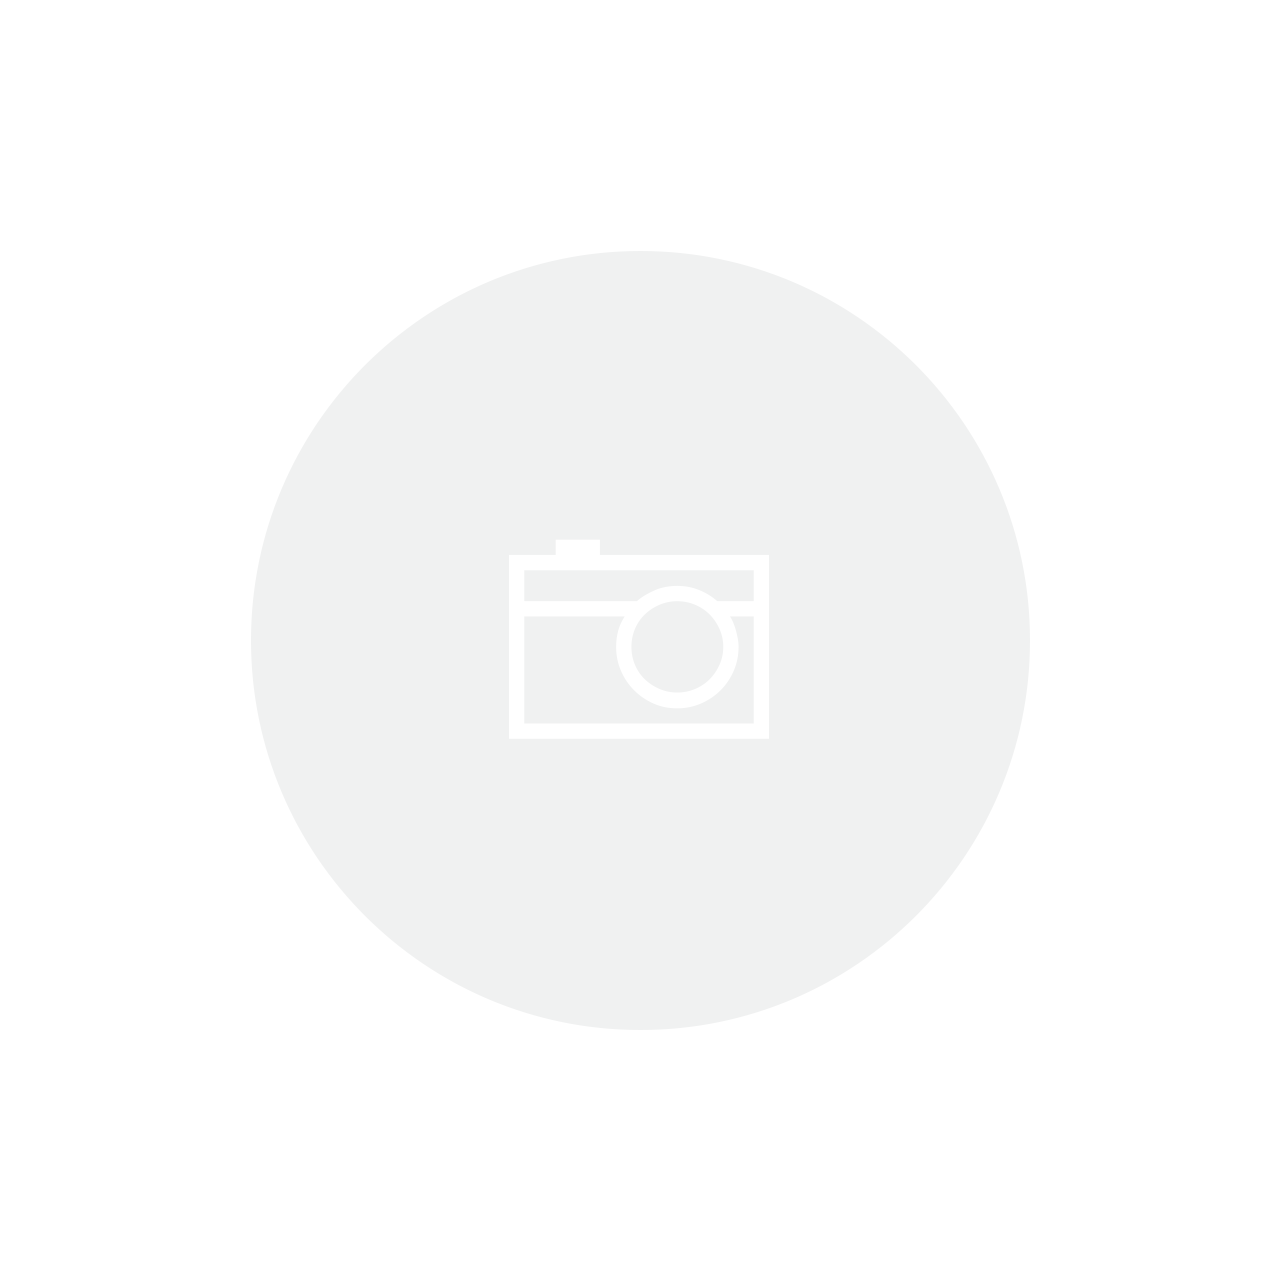 Espumante Salton Classic Meio Doce 660 mL